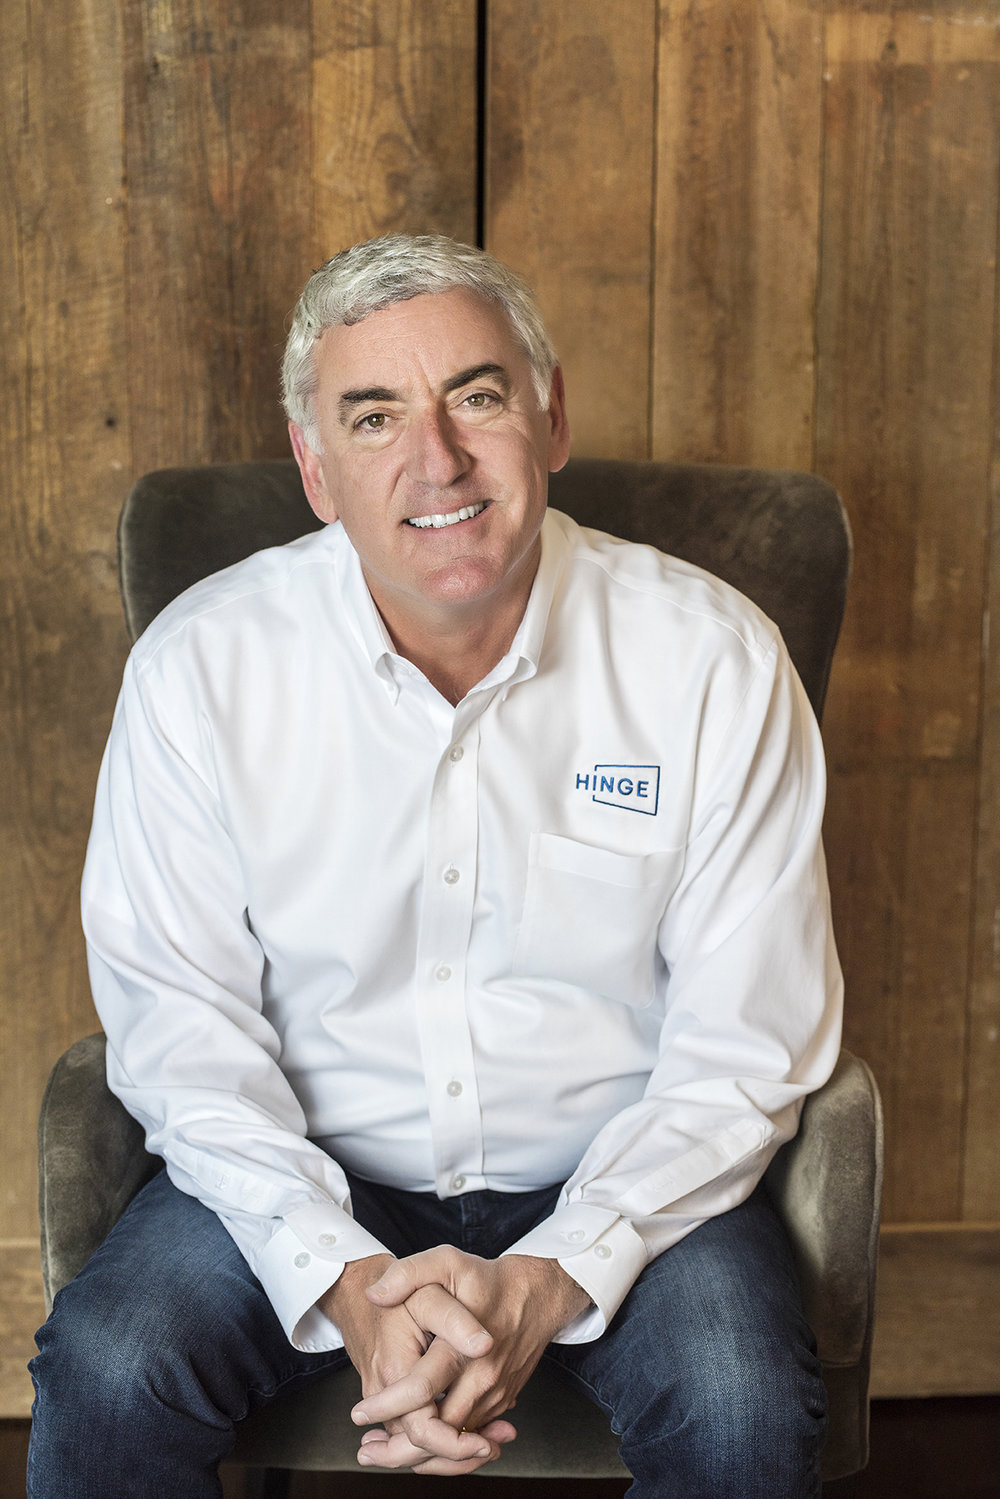 Mike pepper - Senior Broker & National Director of Real Estate